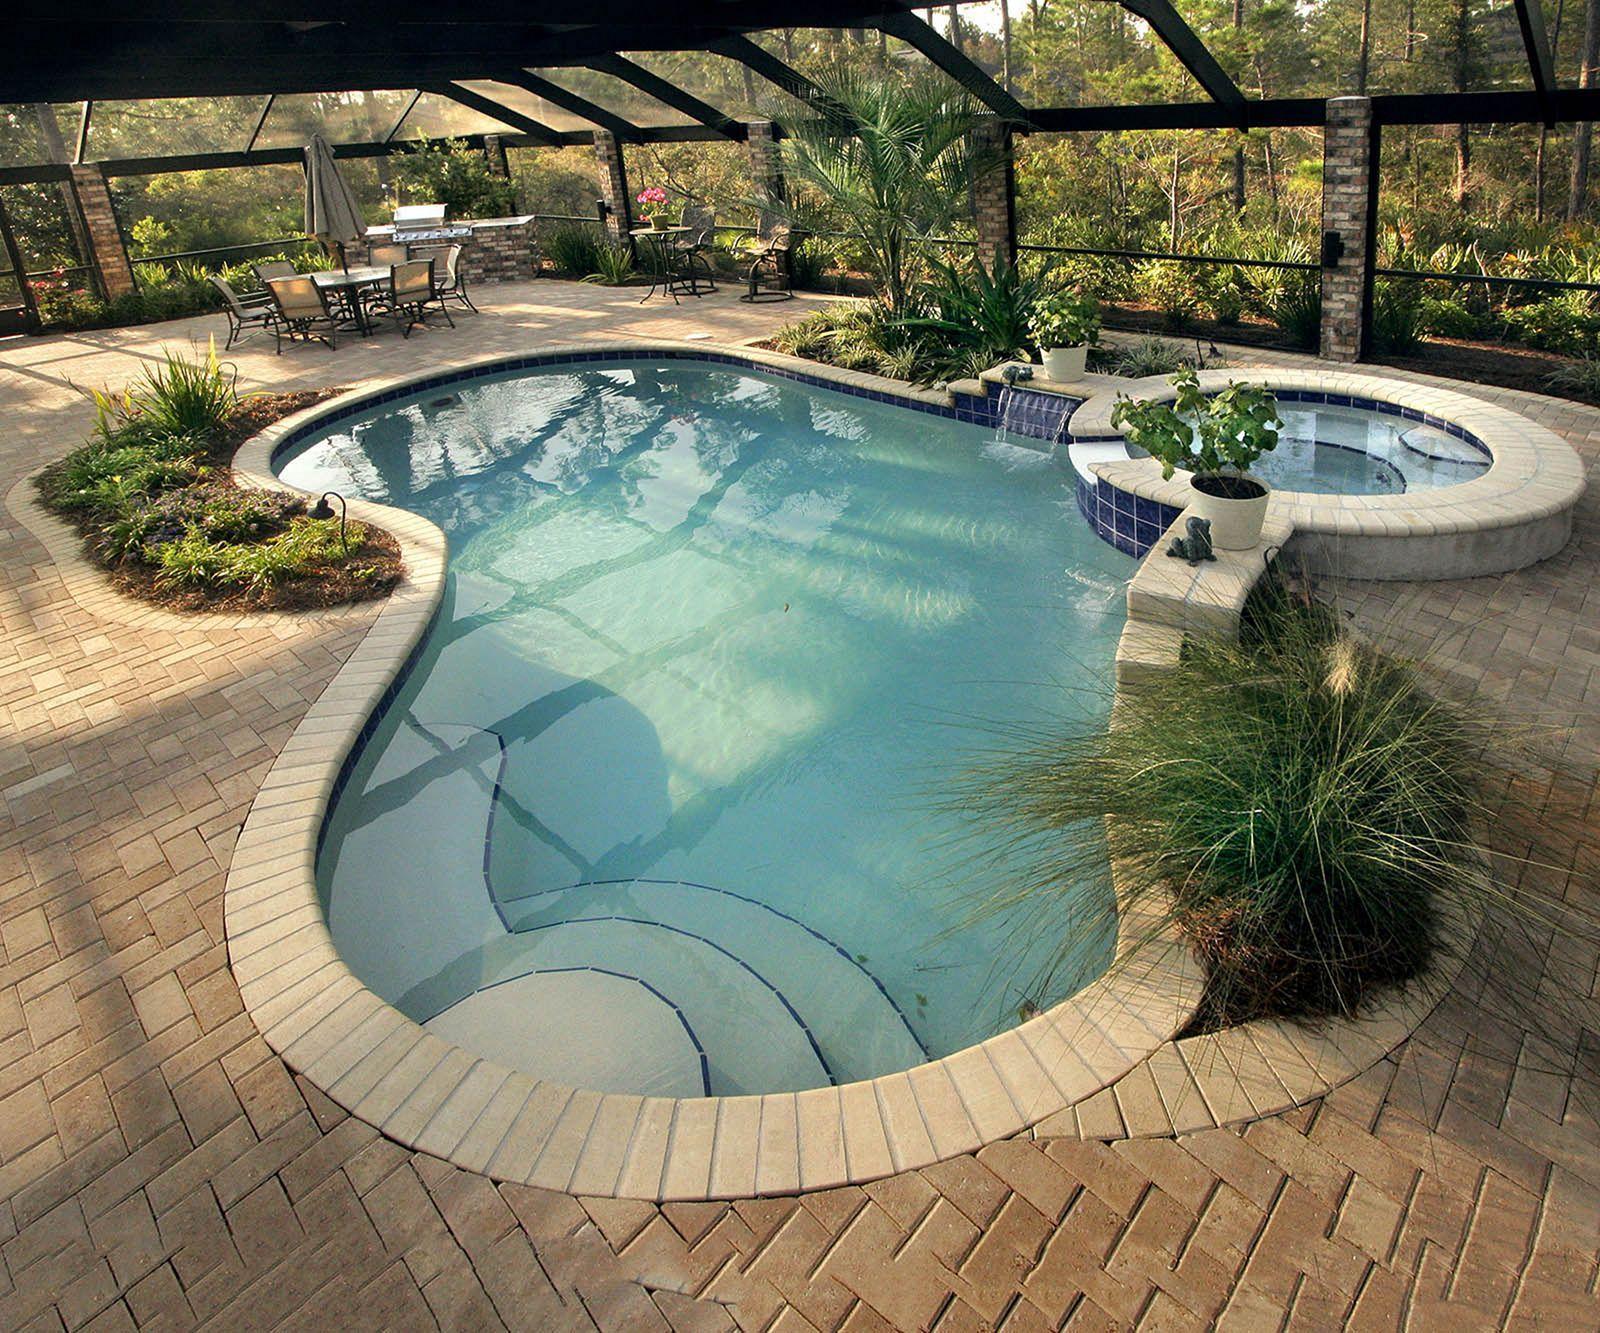 25 Fabulous Backyard Swimming Pool Ideas For Cozy Summer ...